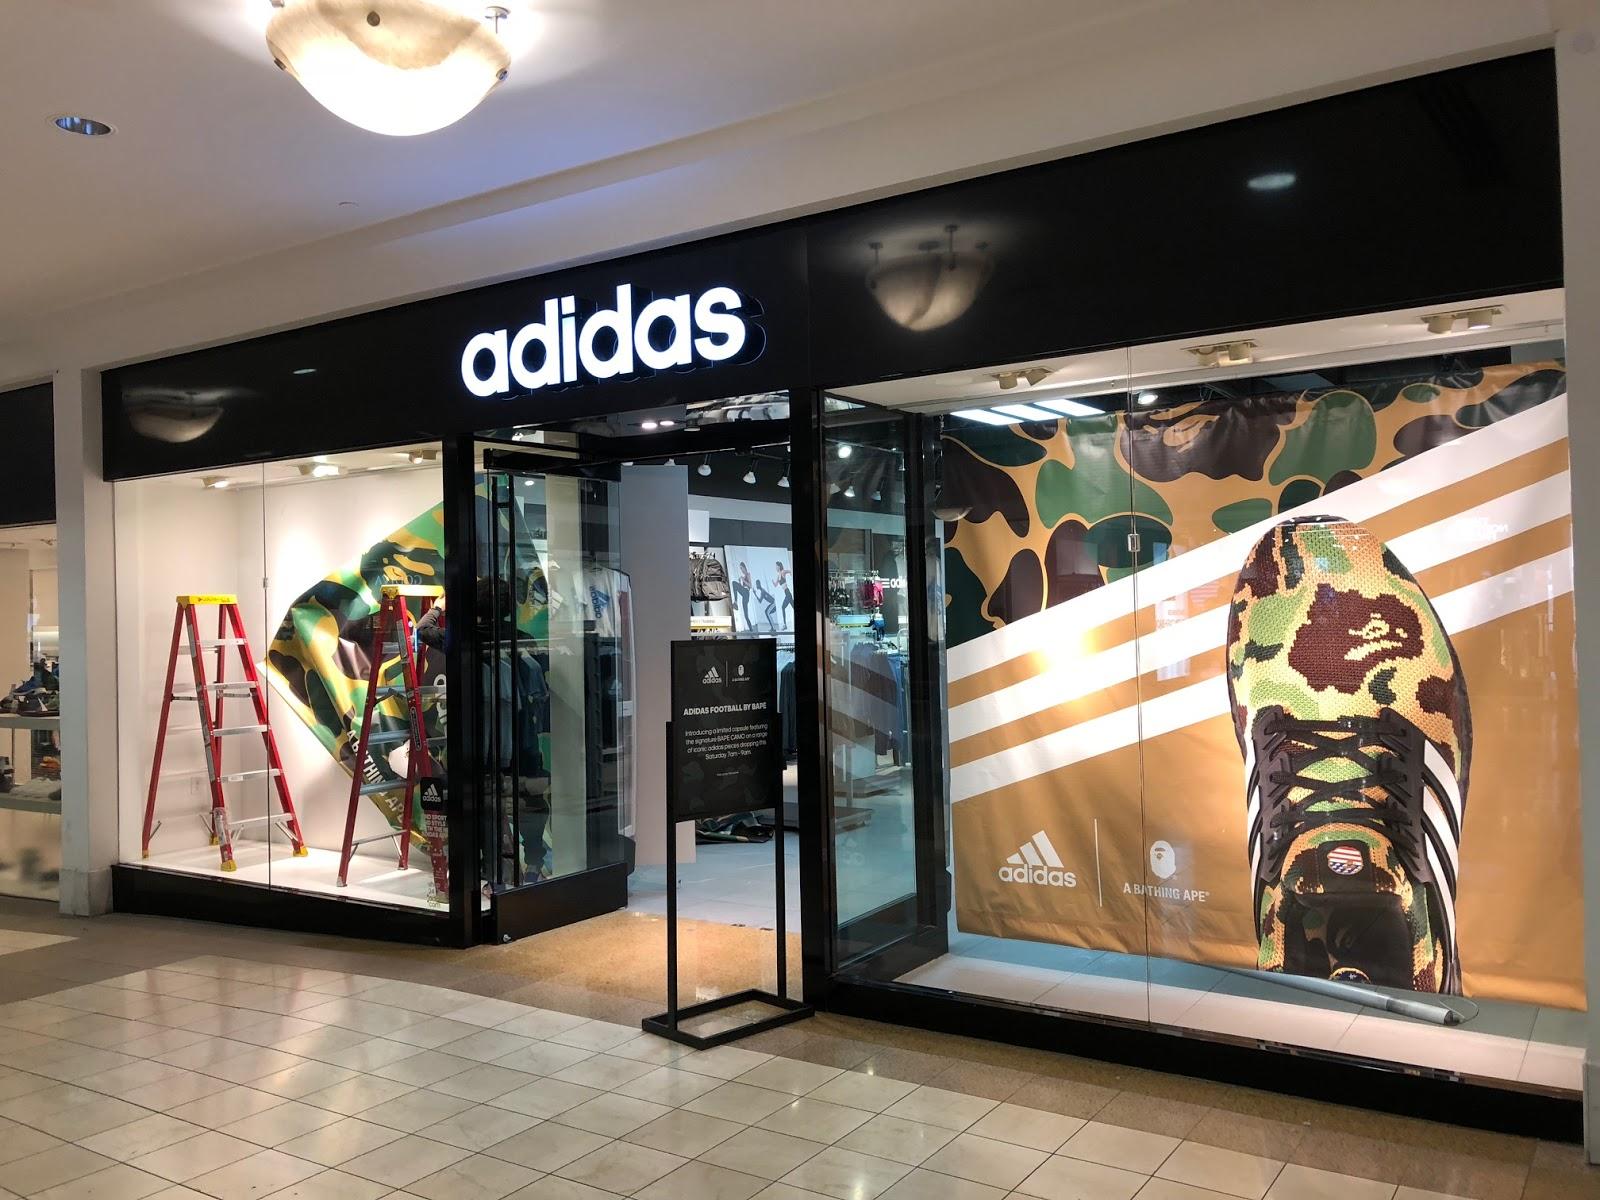 Tomorrow's News Today Atlanta: [ALERT] Adidas Opening